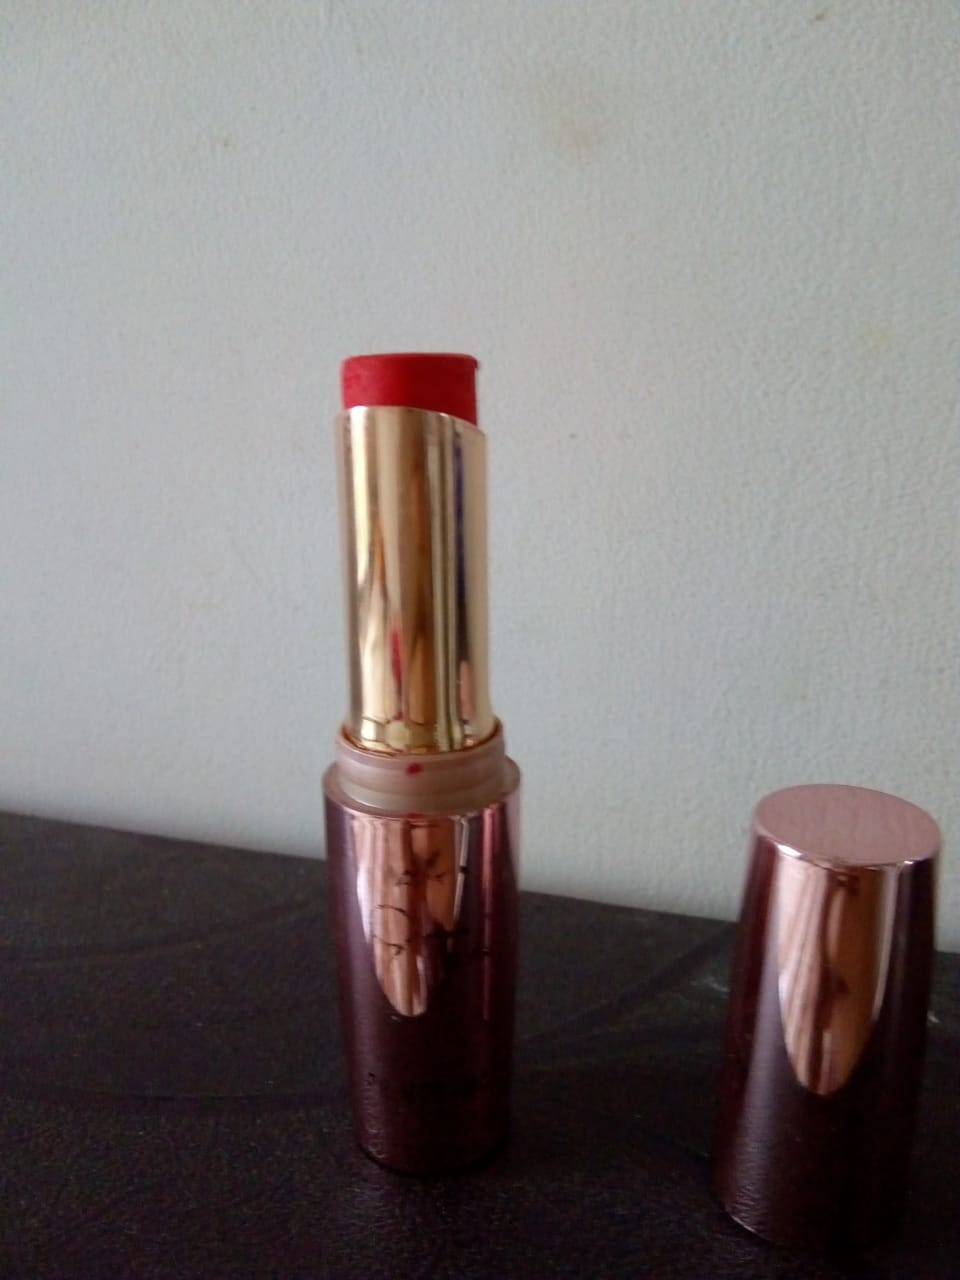 fab-review-My Favorite lipstic-By ruchikumari